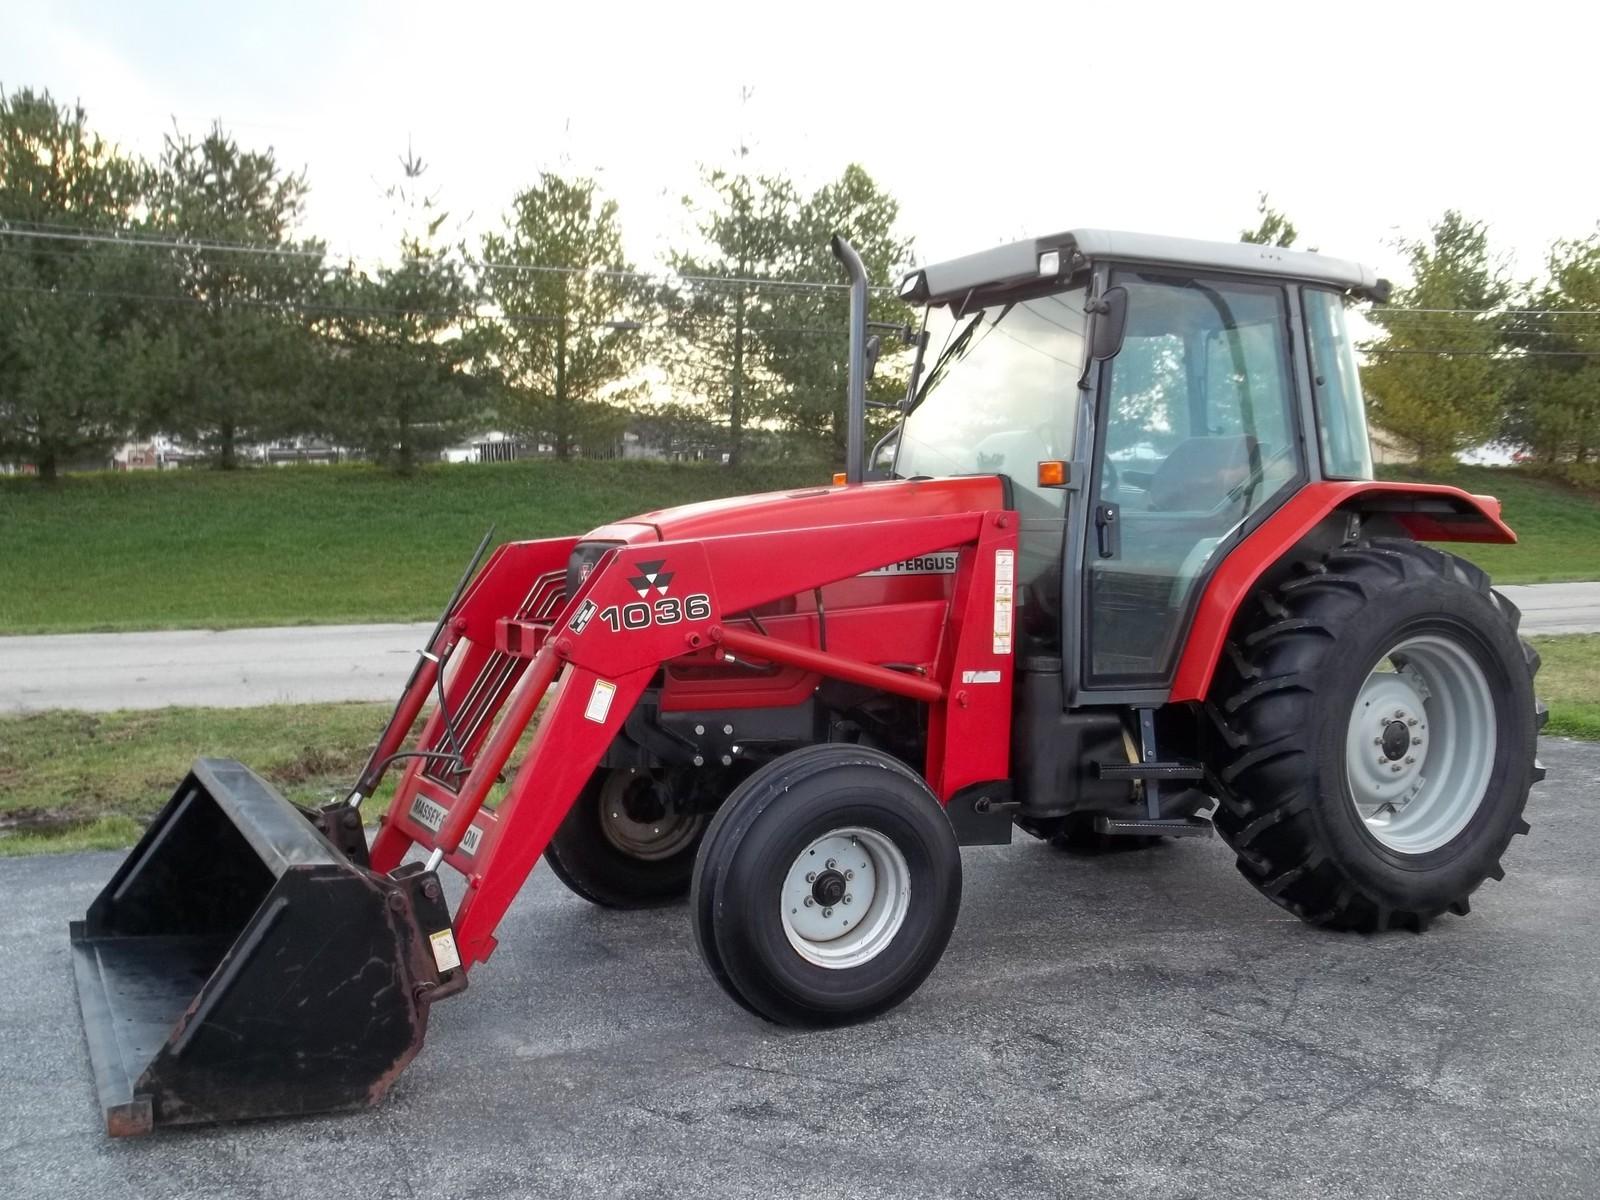 2004 massey ferguson 4243 5400 eur tractors trucks pewsey ltd rh tractors trucks blogspot com massey ferguson 4243 service manual 4243 Massey Ferguson Parts